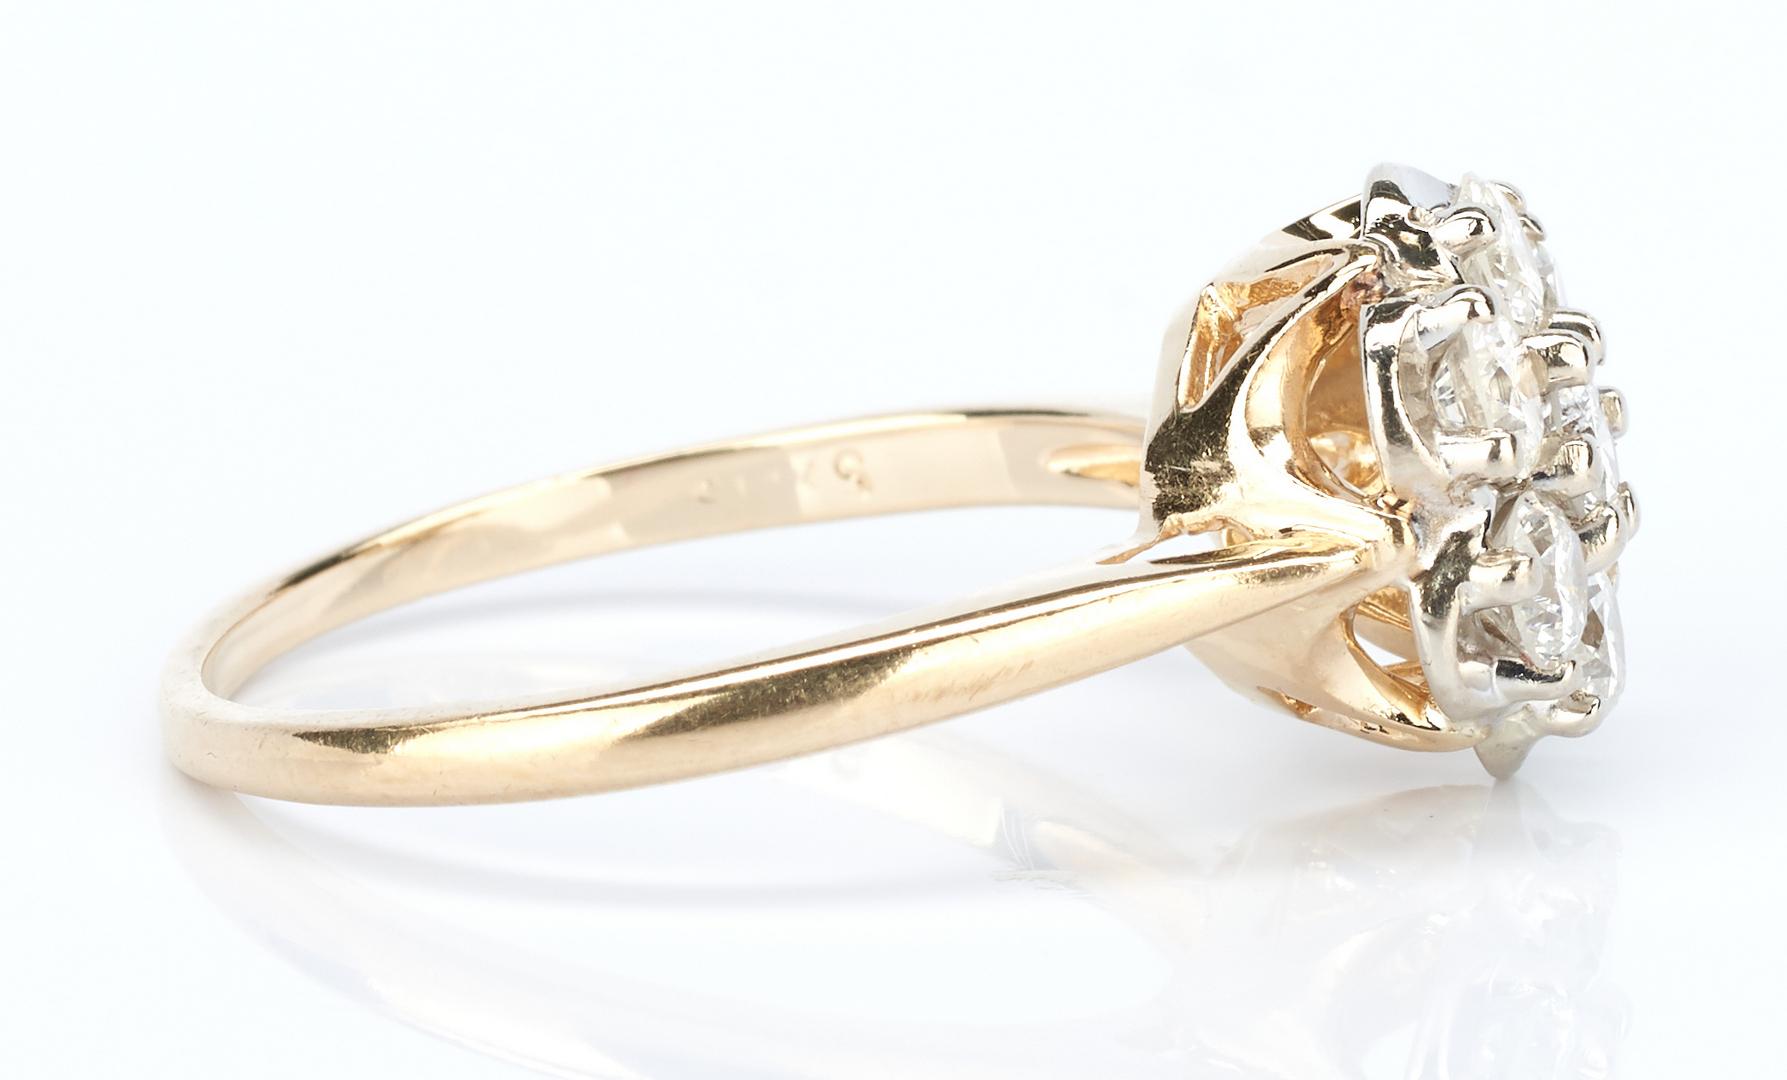 Lot 737: 3 14K Diamond Rings, 2 sets & 1 single